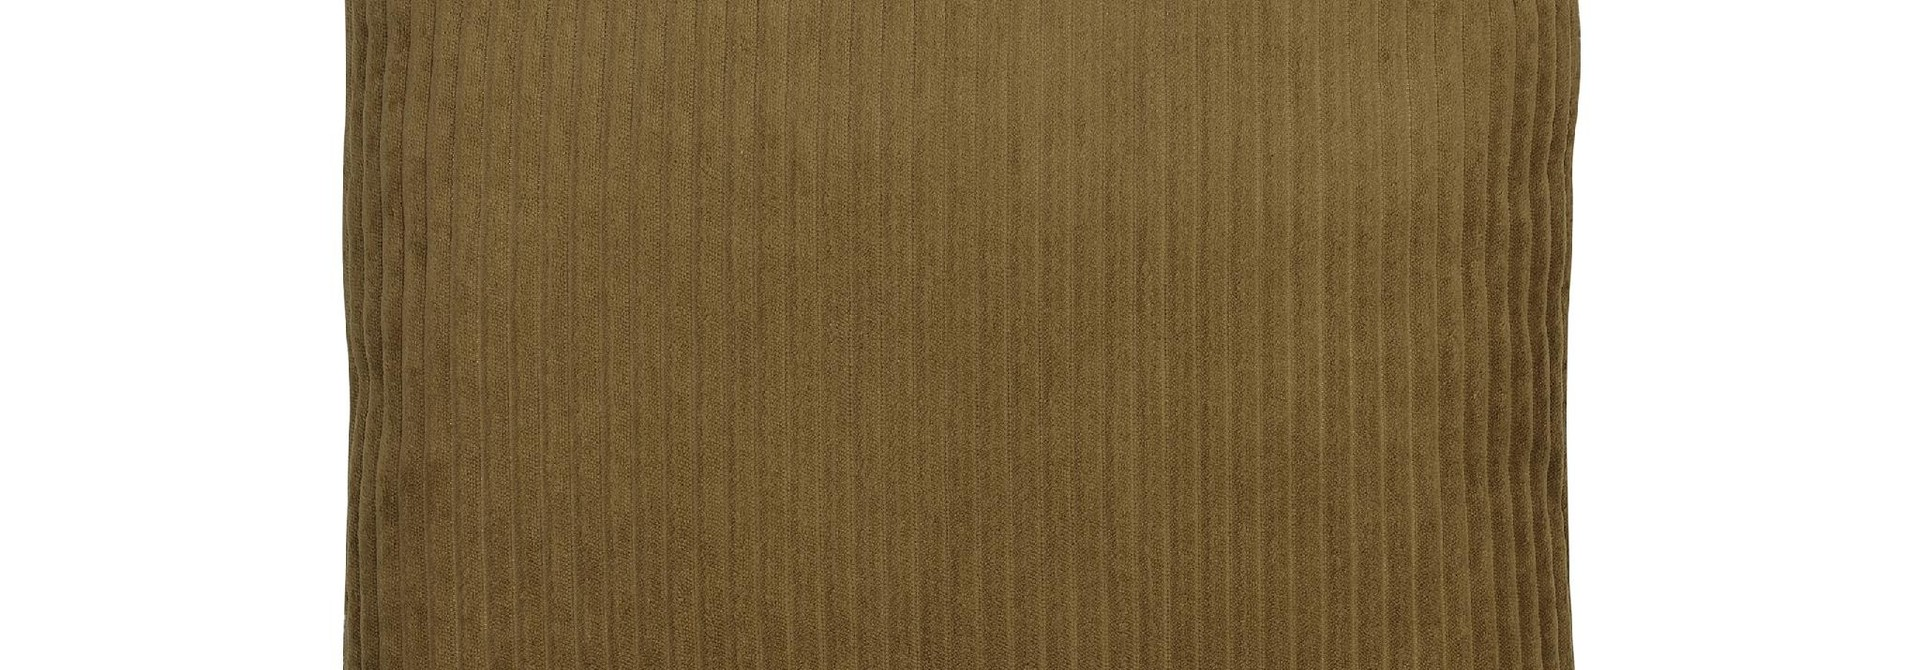 Kussen Dark Beige Corduroy Velvet - 45 x 45 cm